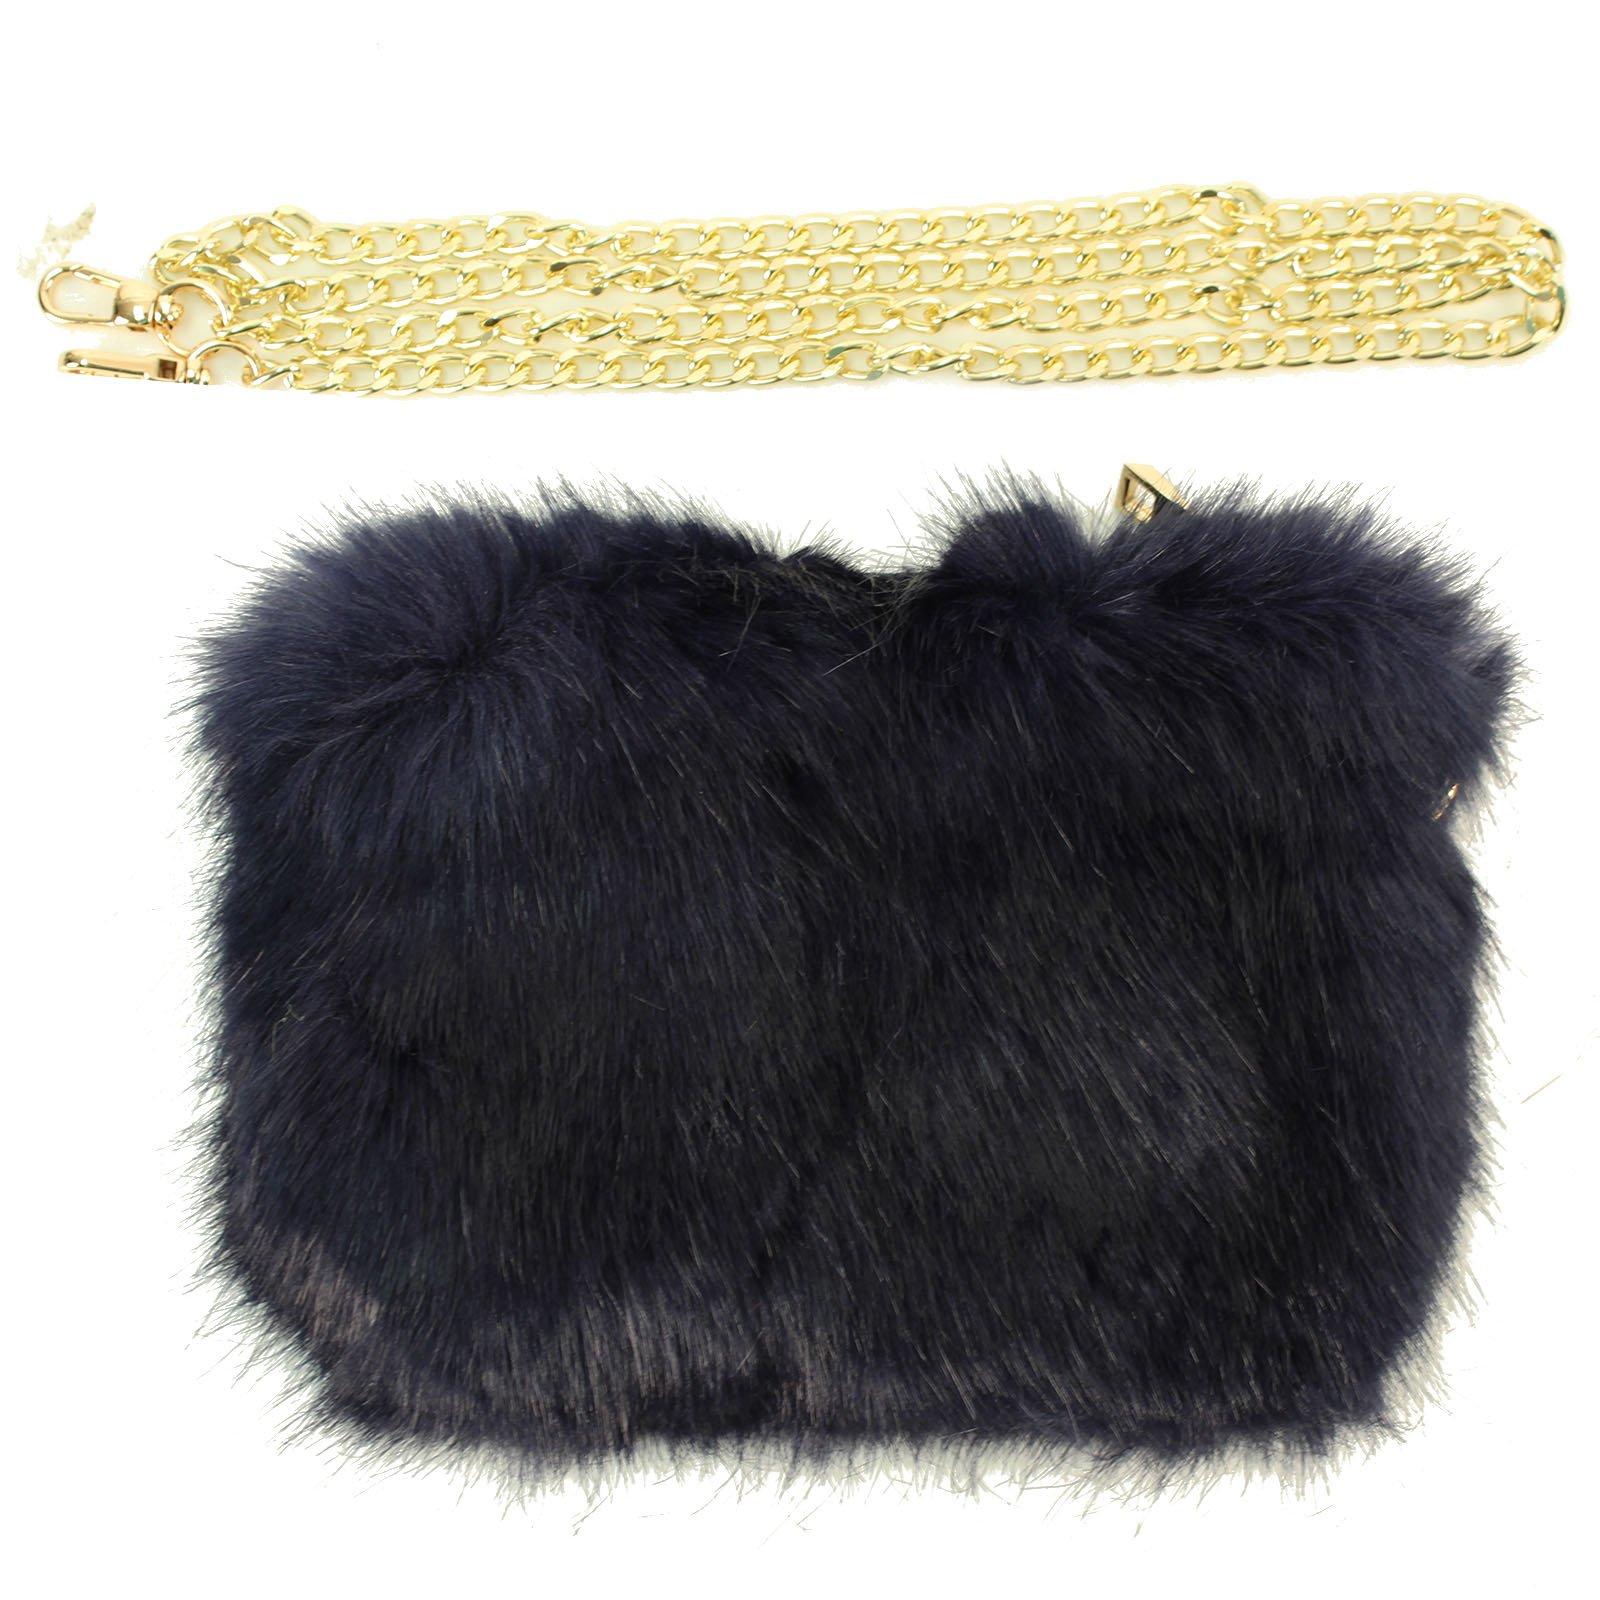 Winter CC Faux Fur Furry Crossbody Shoulder Handbag Wristlet Clutch Purse Navy (801)